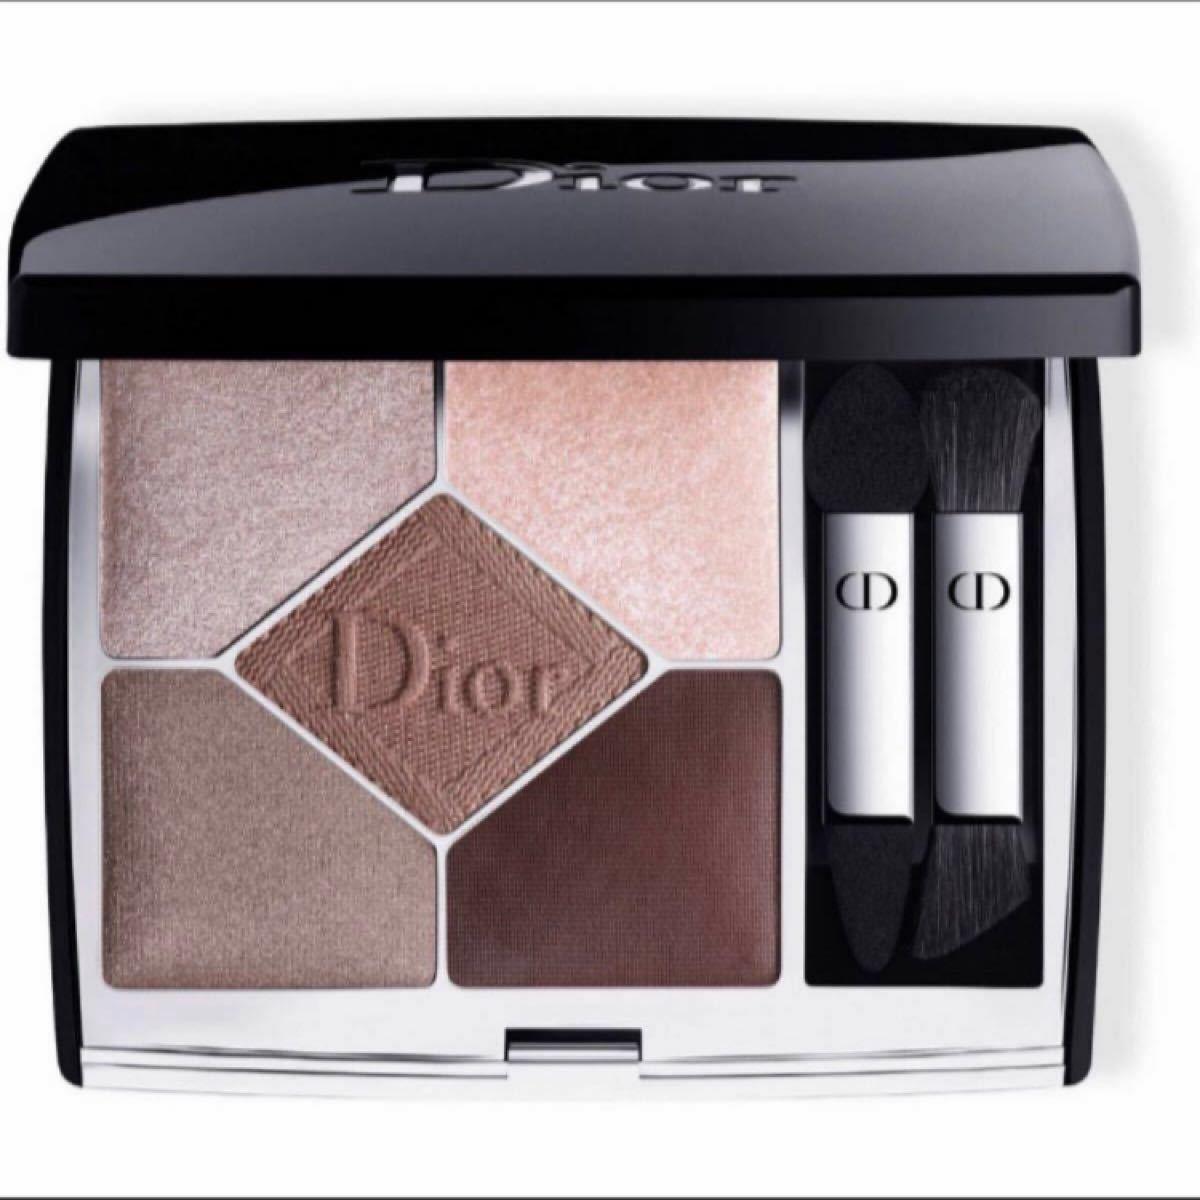 Dior サンククルール ソフトカシミア